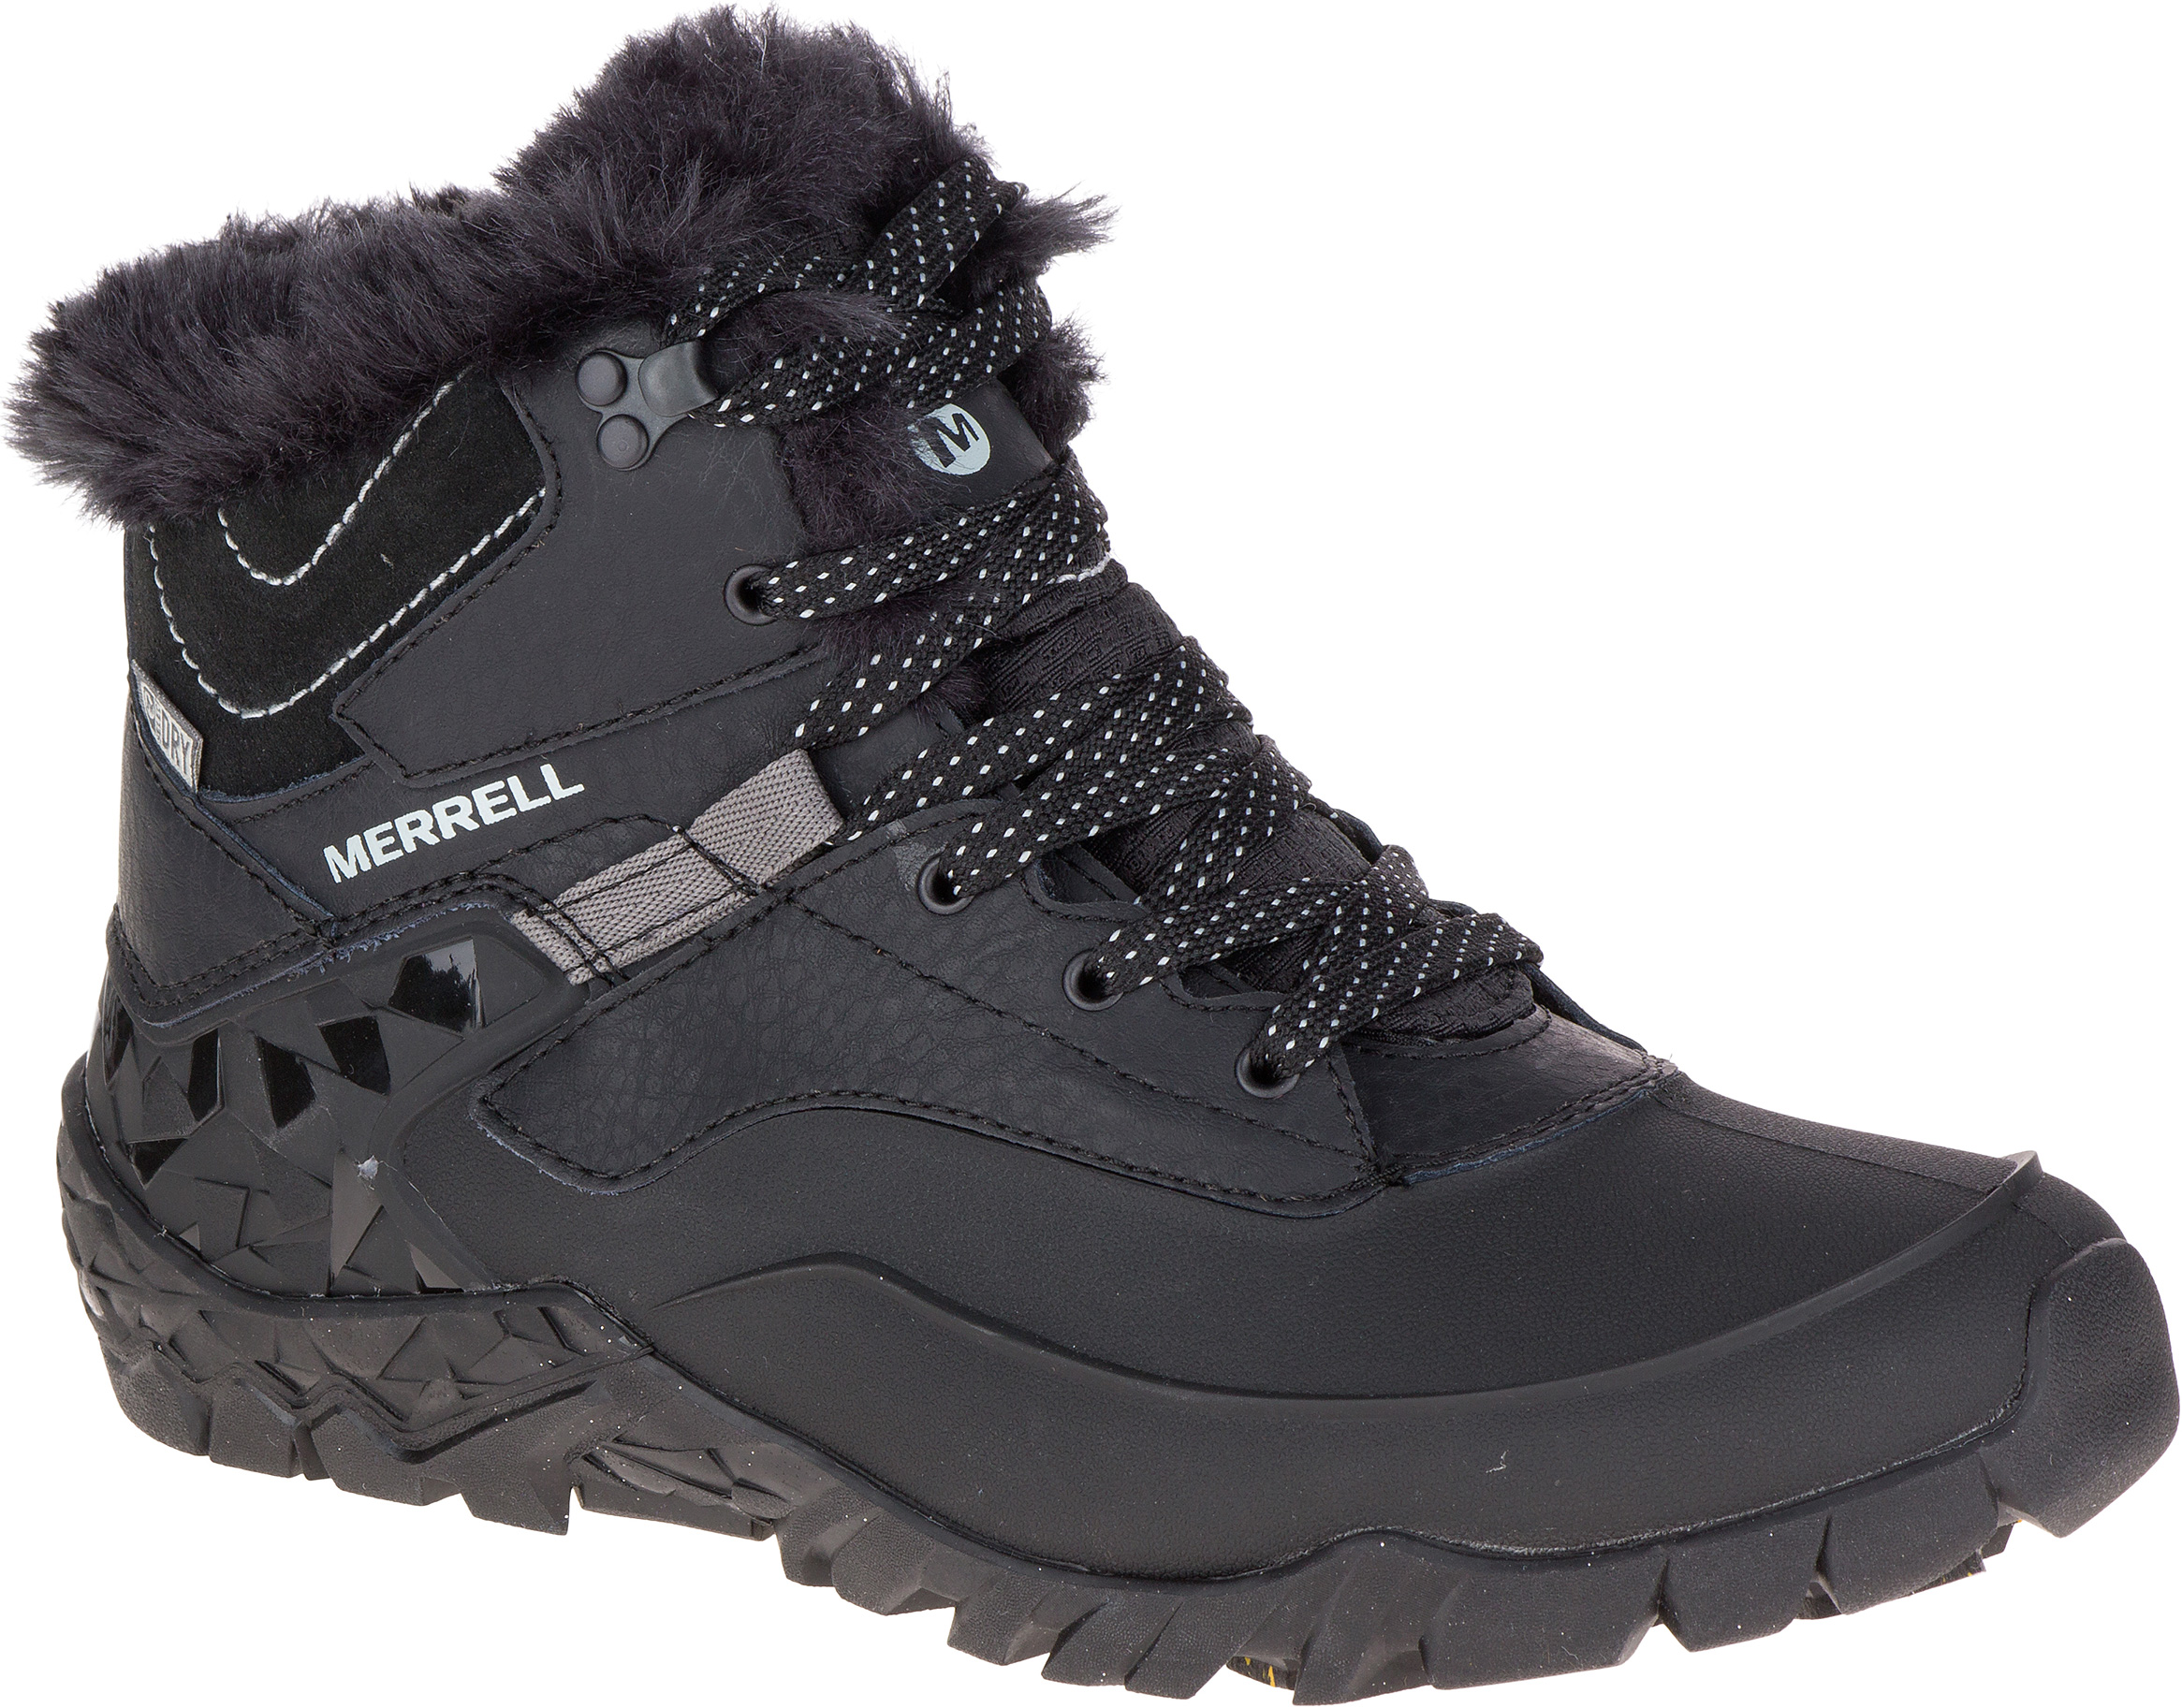 Merrell Aurora 6 Ice Waterproof 37216 EUR 38